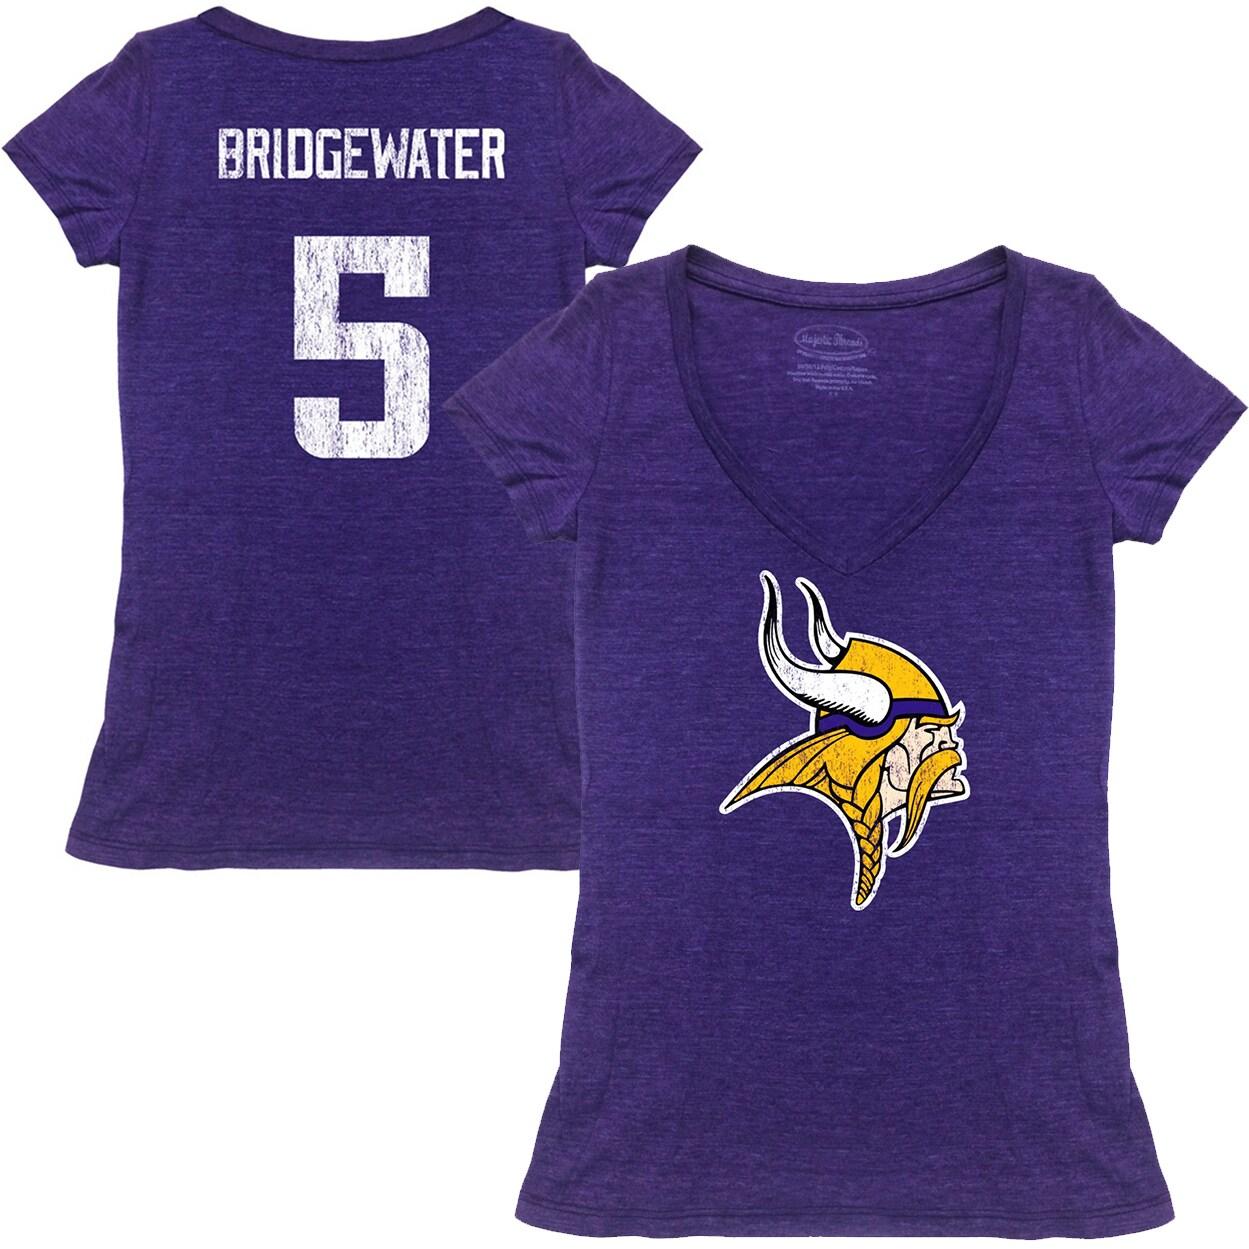 Teddy Bridgewater Minnesota Vikings Tri-Blend Name & Number T-Shirt - Purple